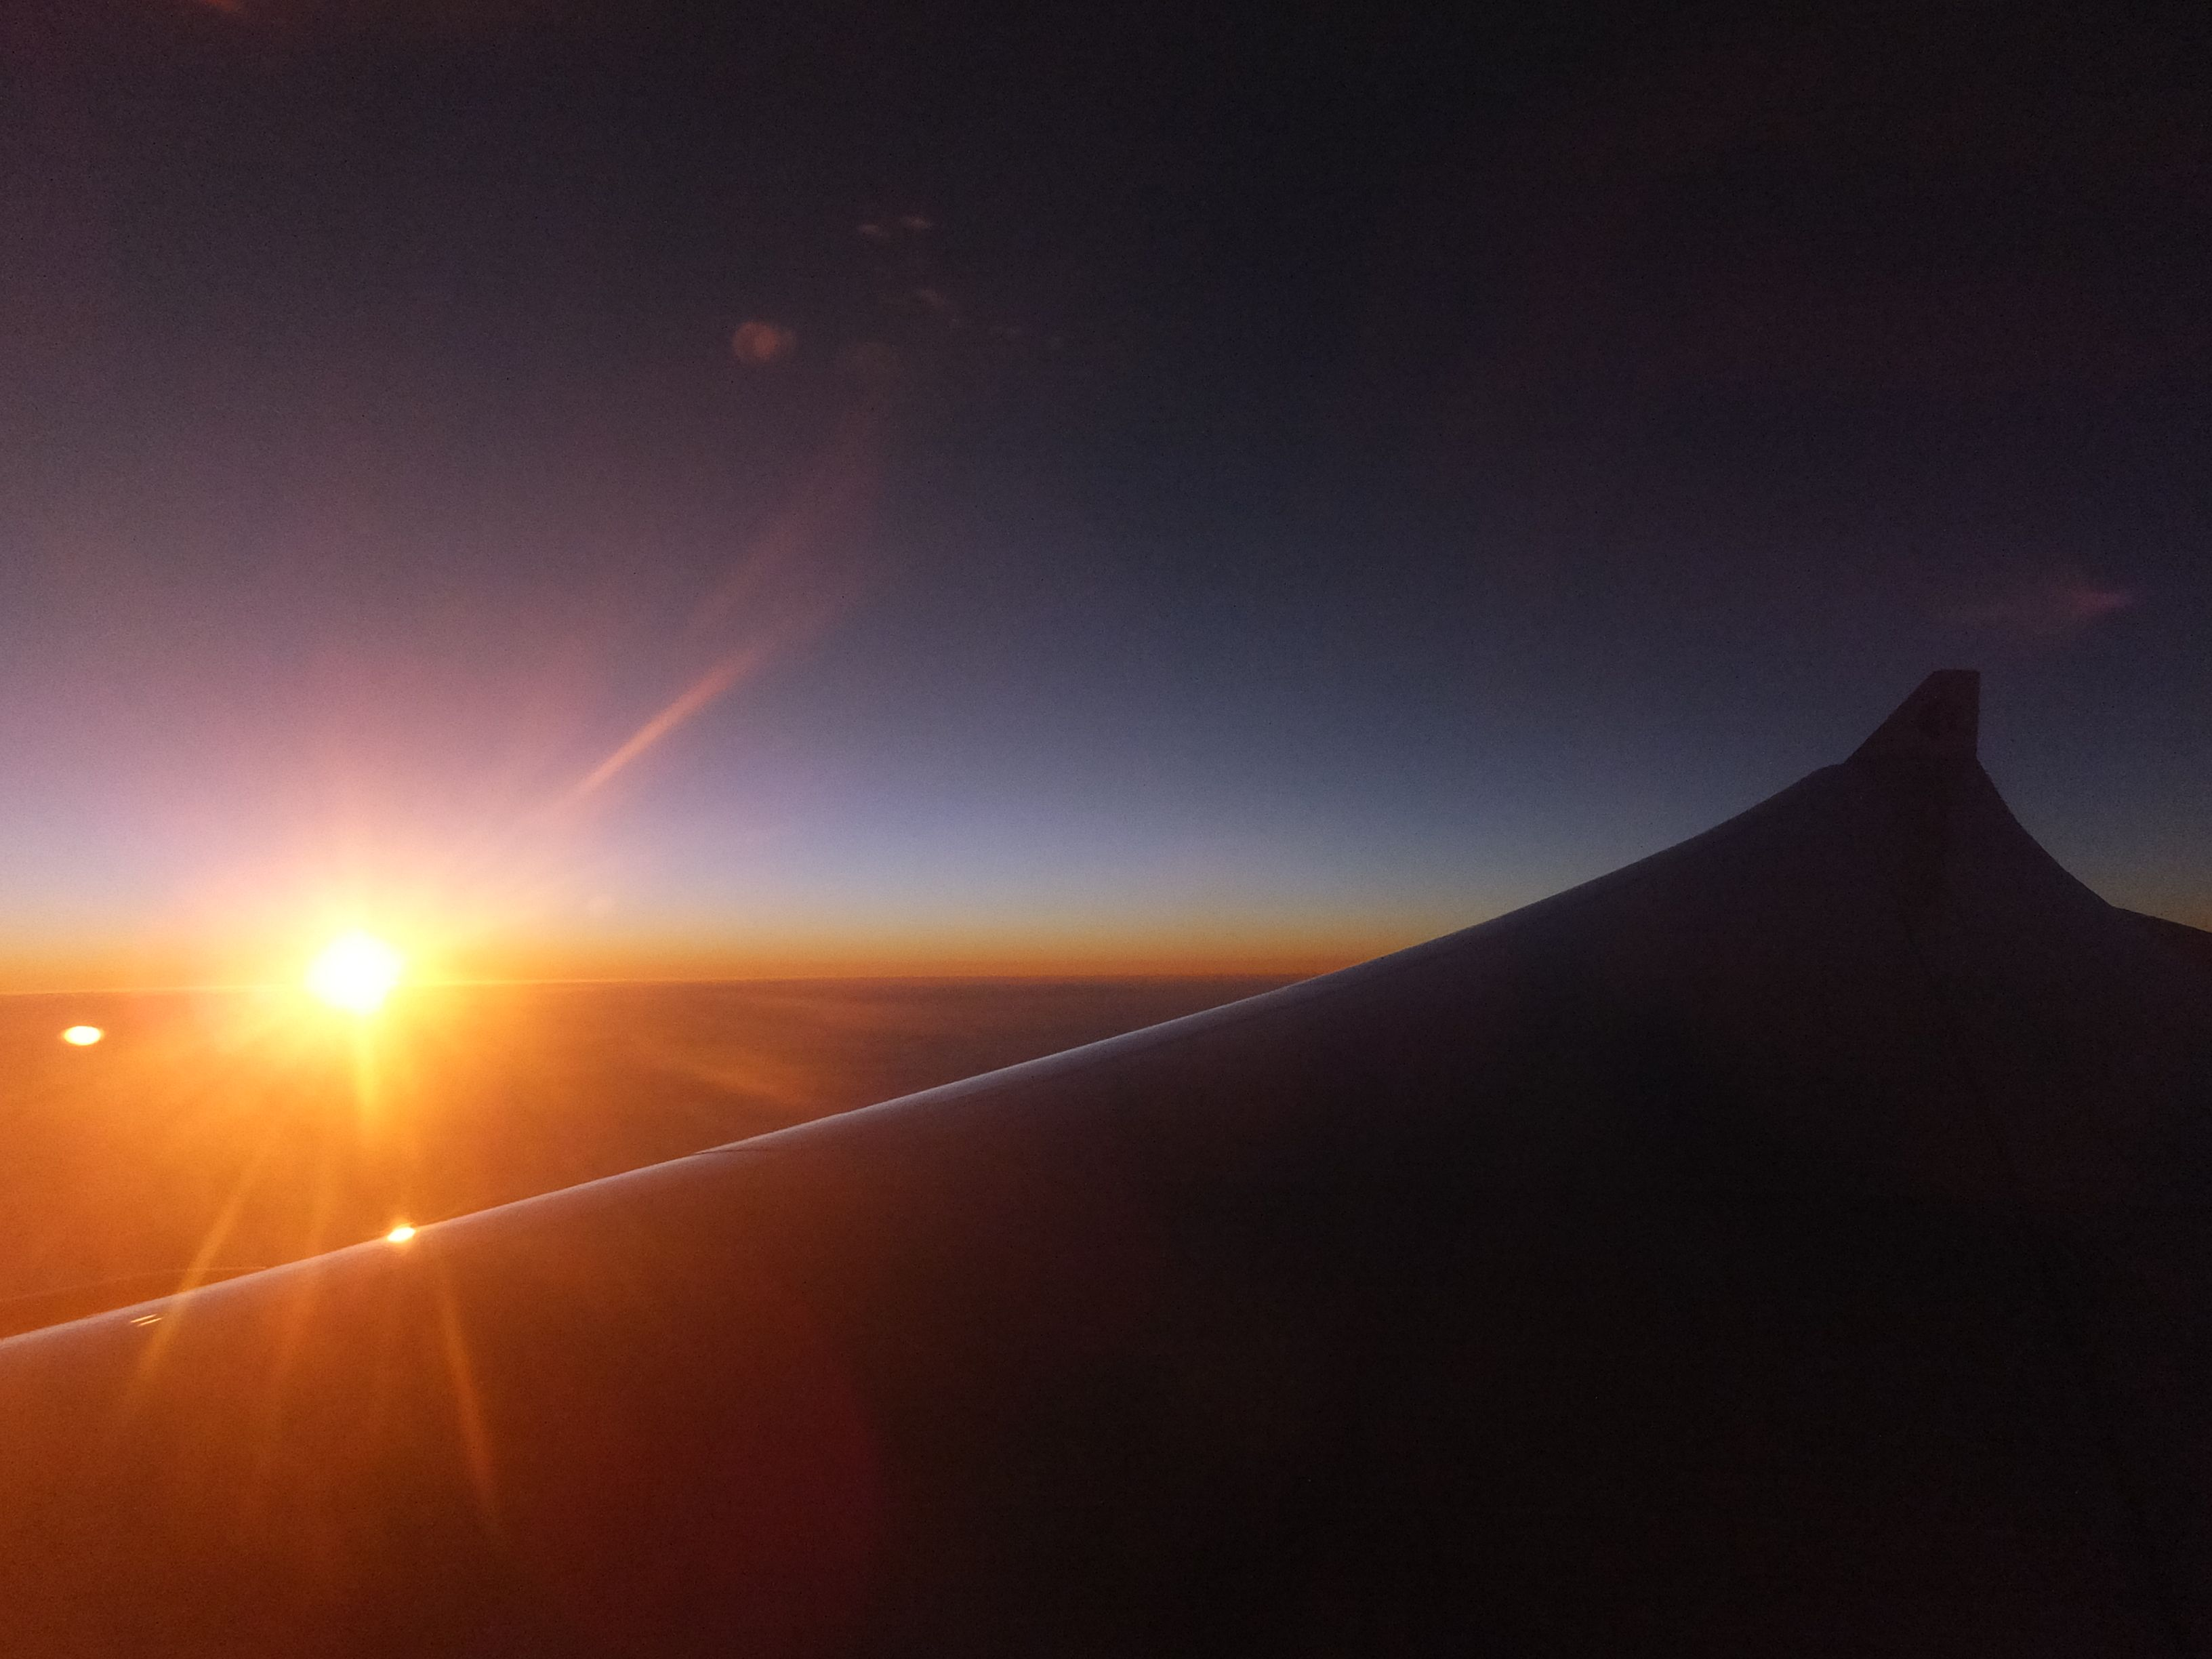 Sunrise at Airplane